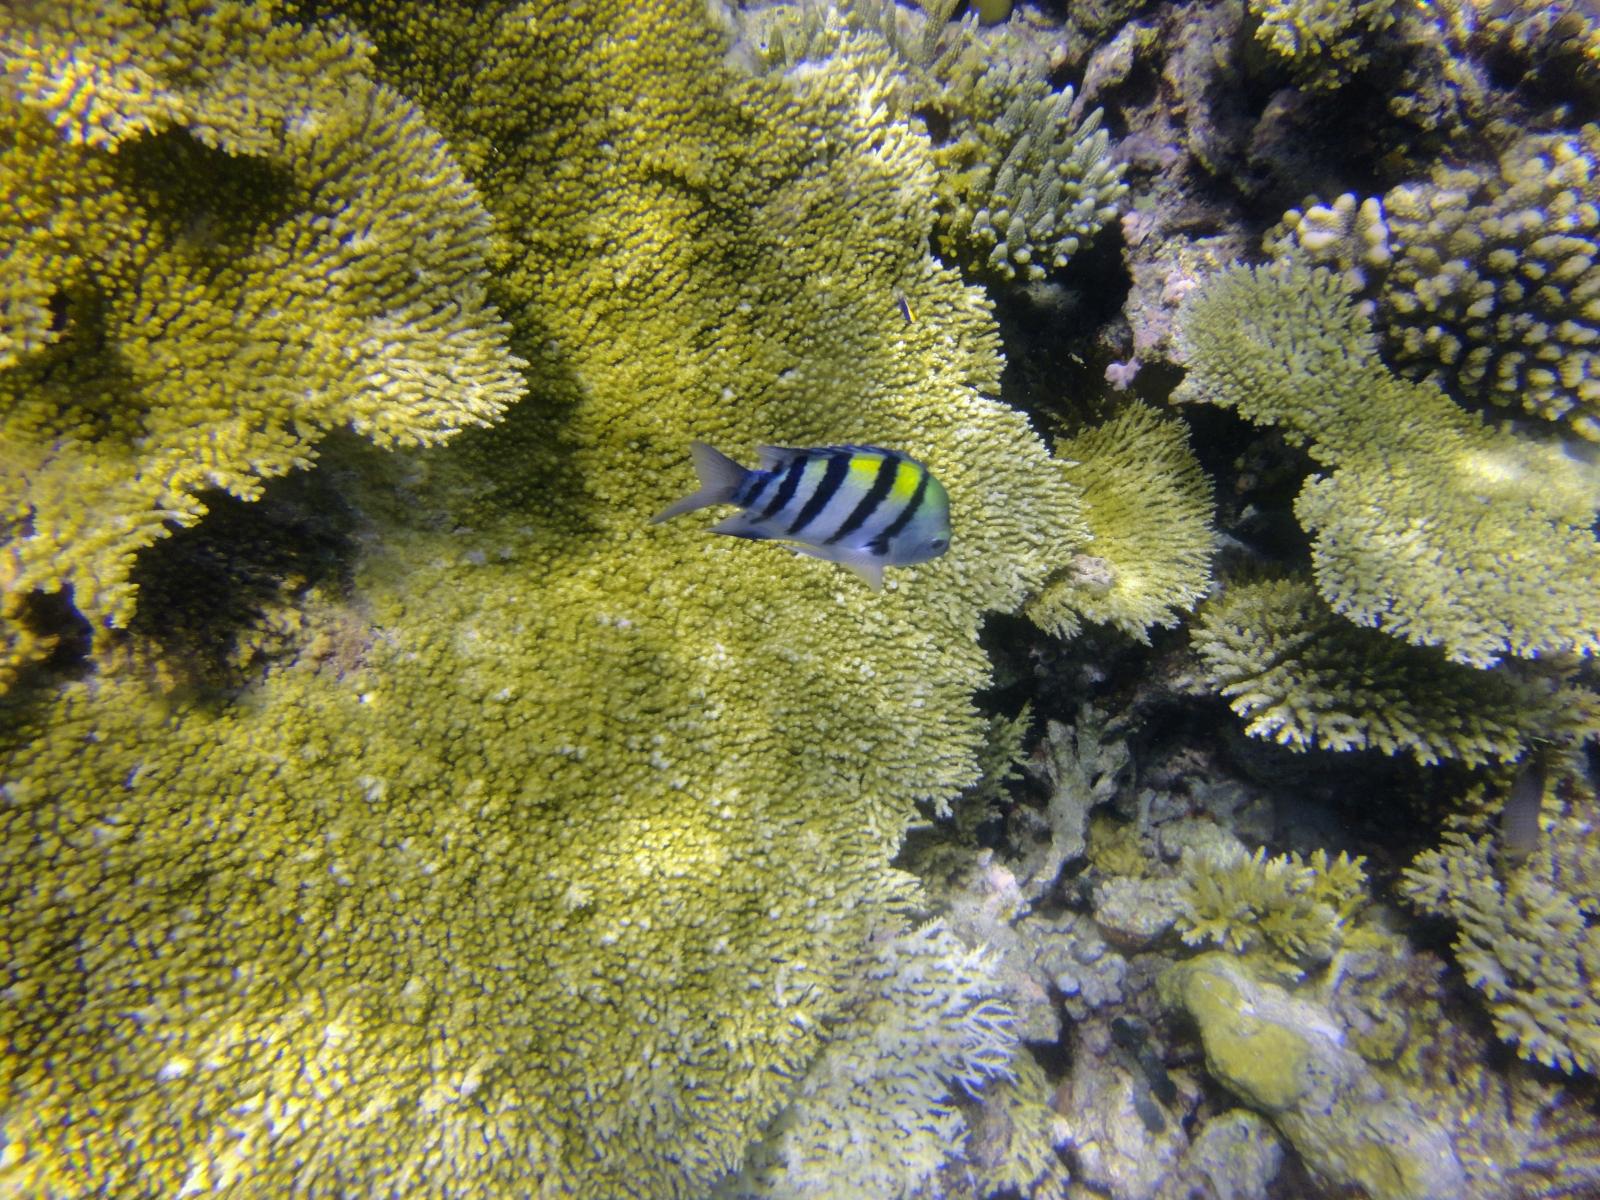 Abudefduf_vaigiensis_006_C_Damiselas-Peces-Payaso_L_Maldivas_U_Sebas_04072015